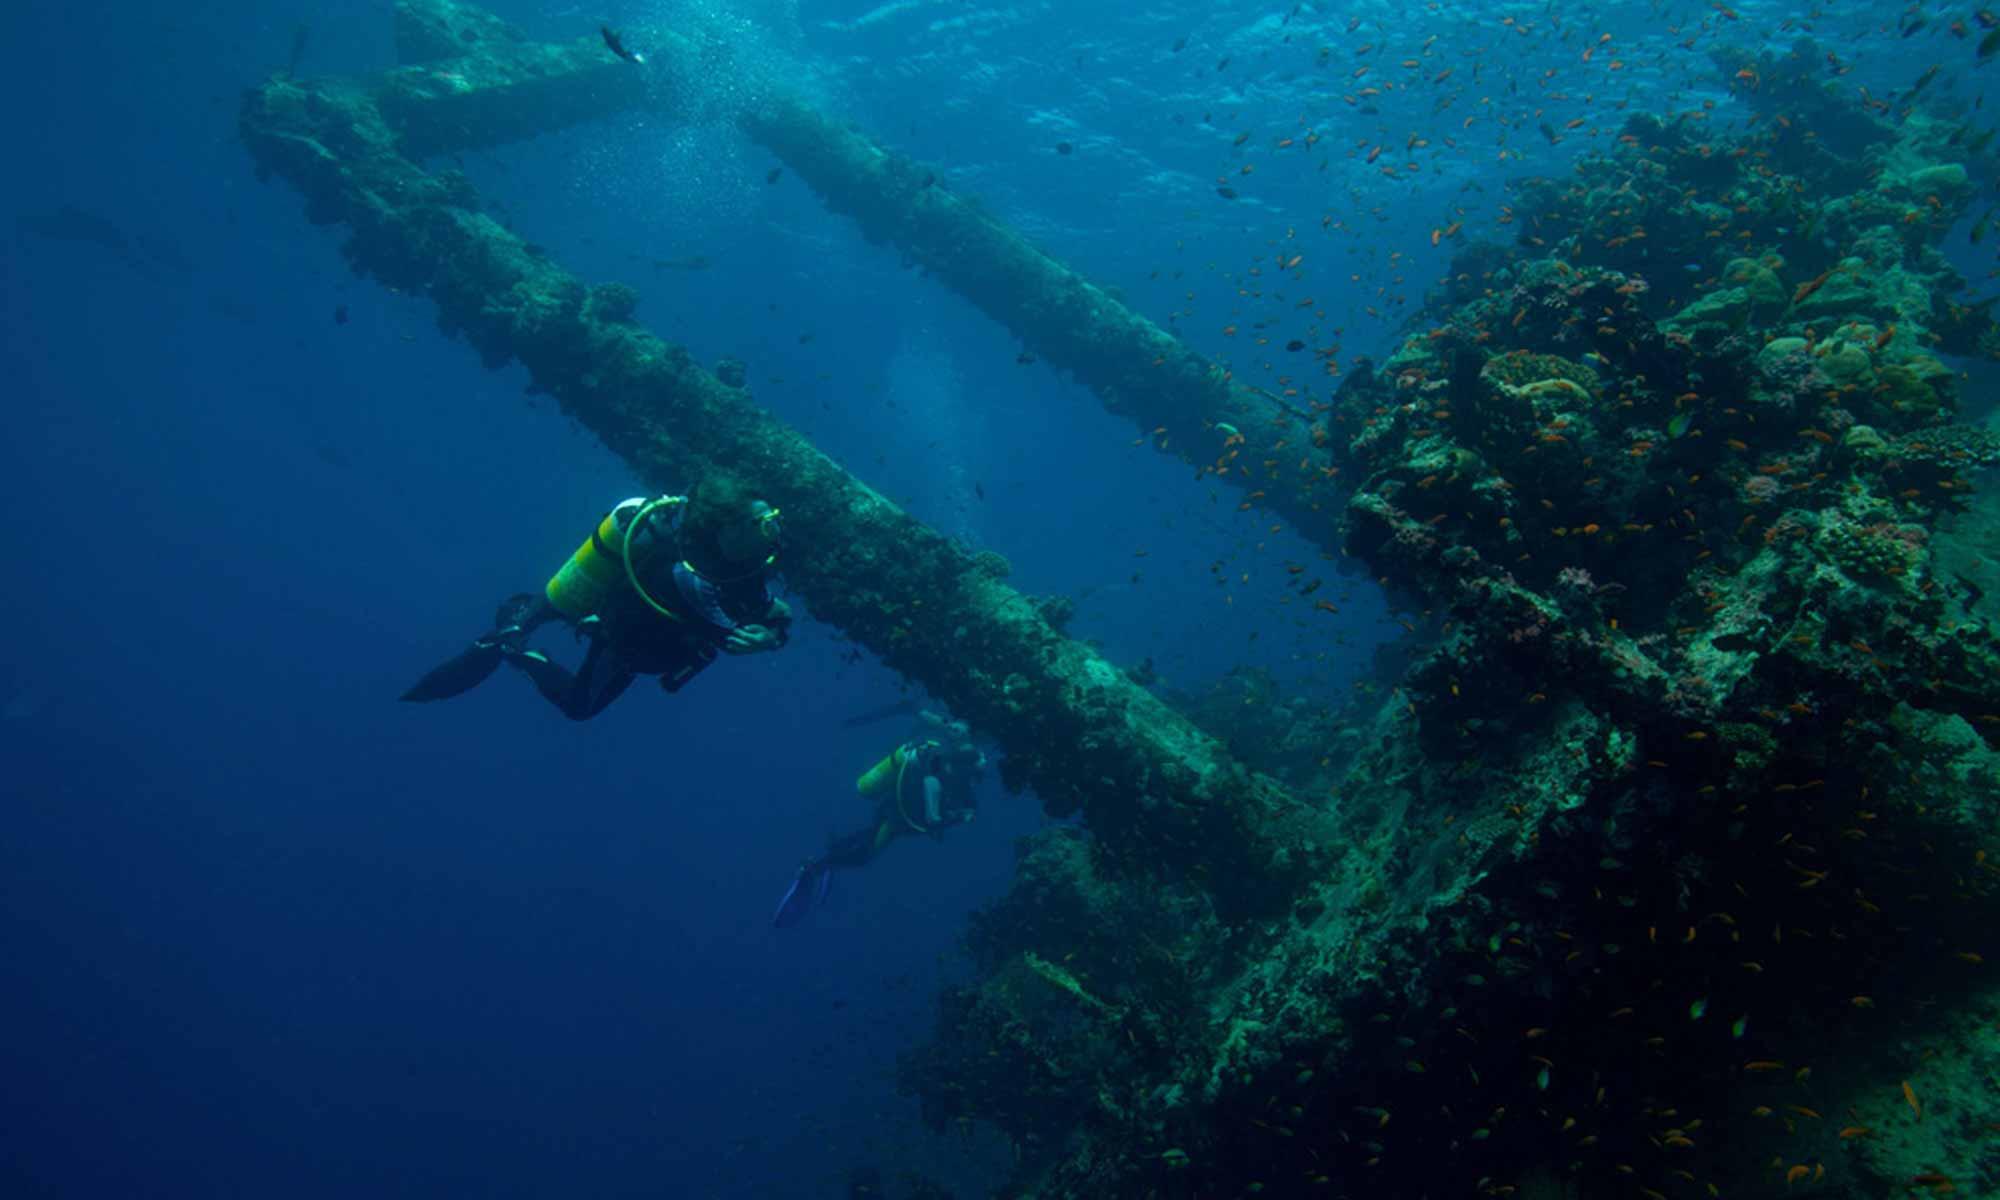 Slow Dive Indischer Ozean Malediven Pro Divers Kuredu Wrack